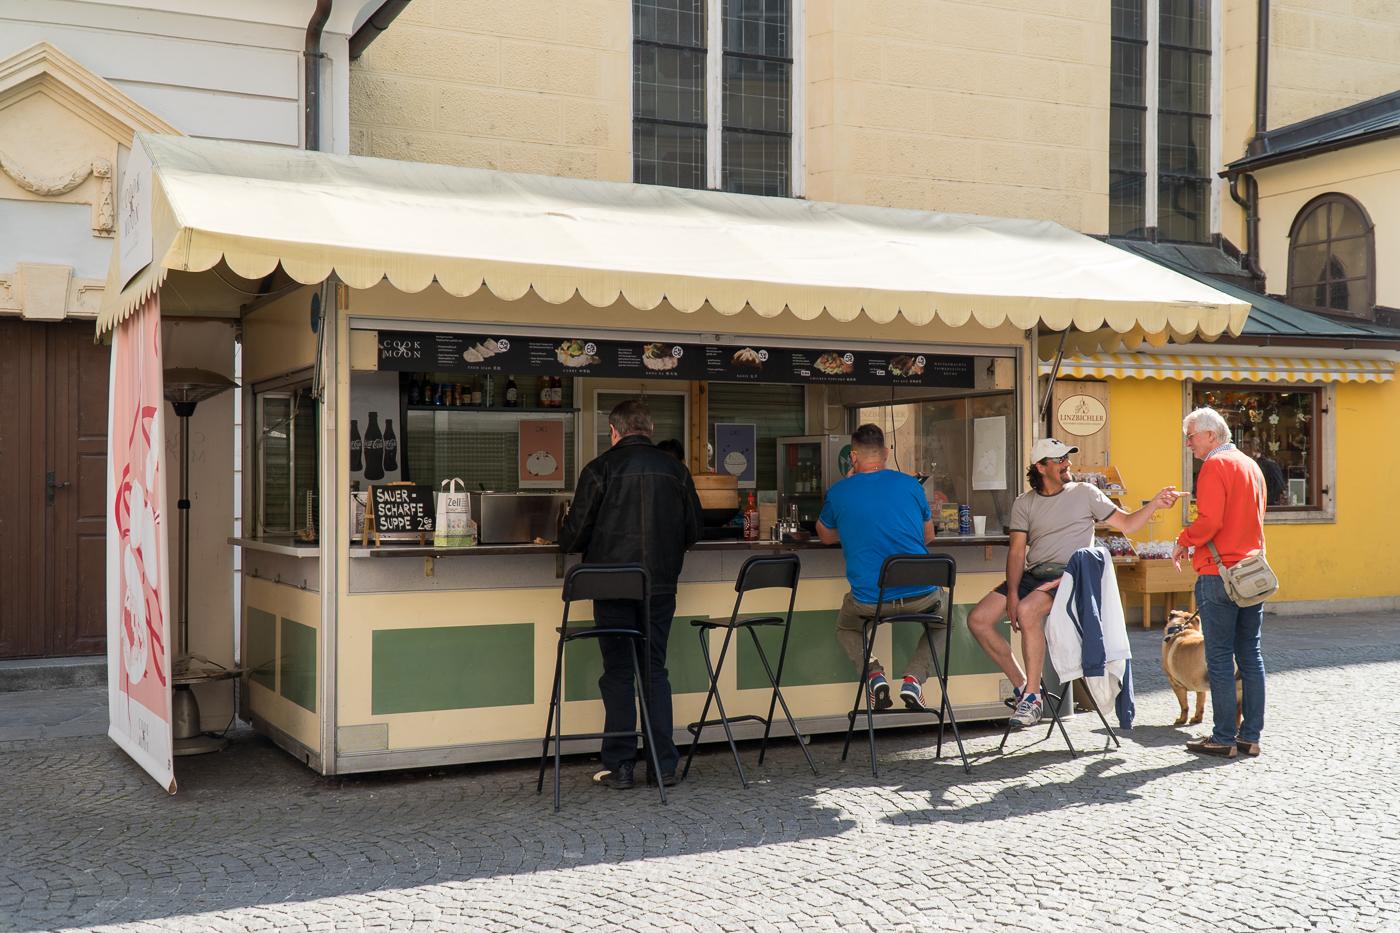 Kiosque de street food dumplings à Graz